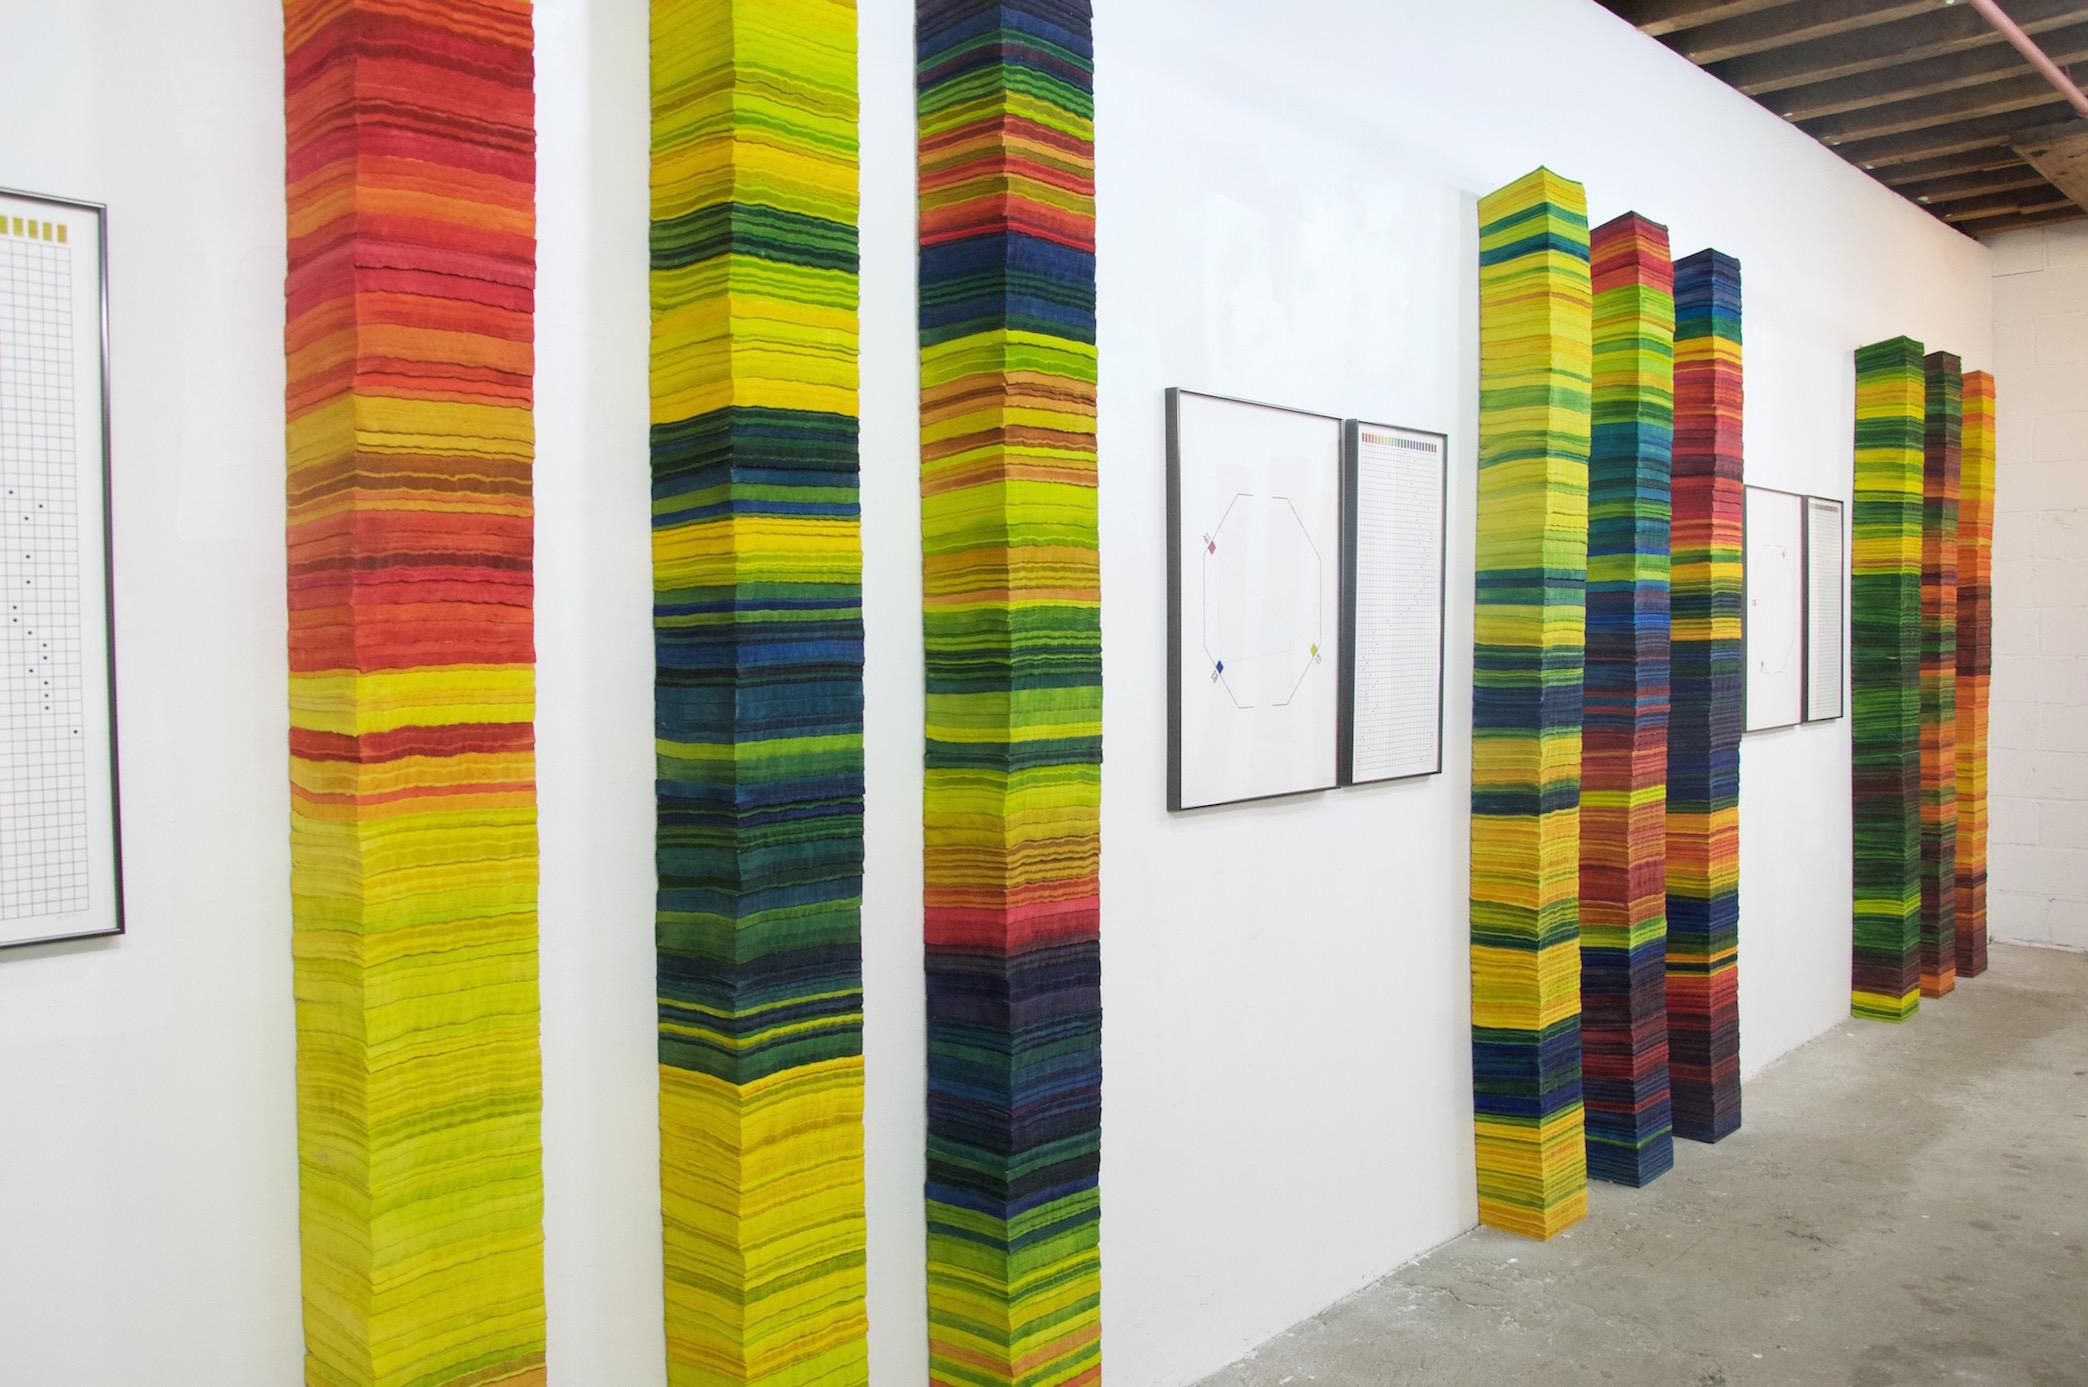 Murken_Continua_install_Brooklyn_Waterfront_Artists_Collective_02.jpg